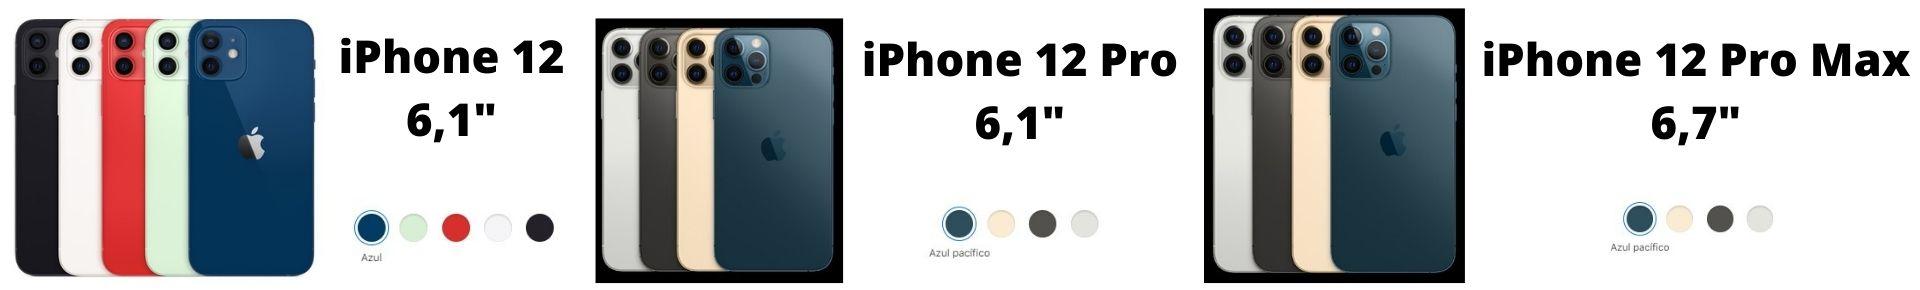 Colores disponibles iPhone 12-12 Pro-12 Pro Max